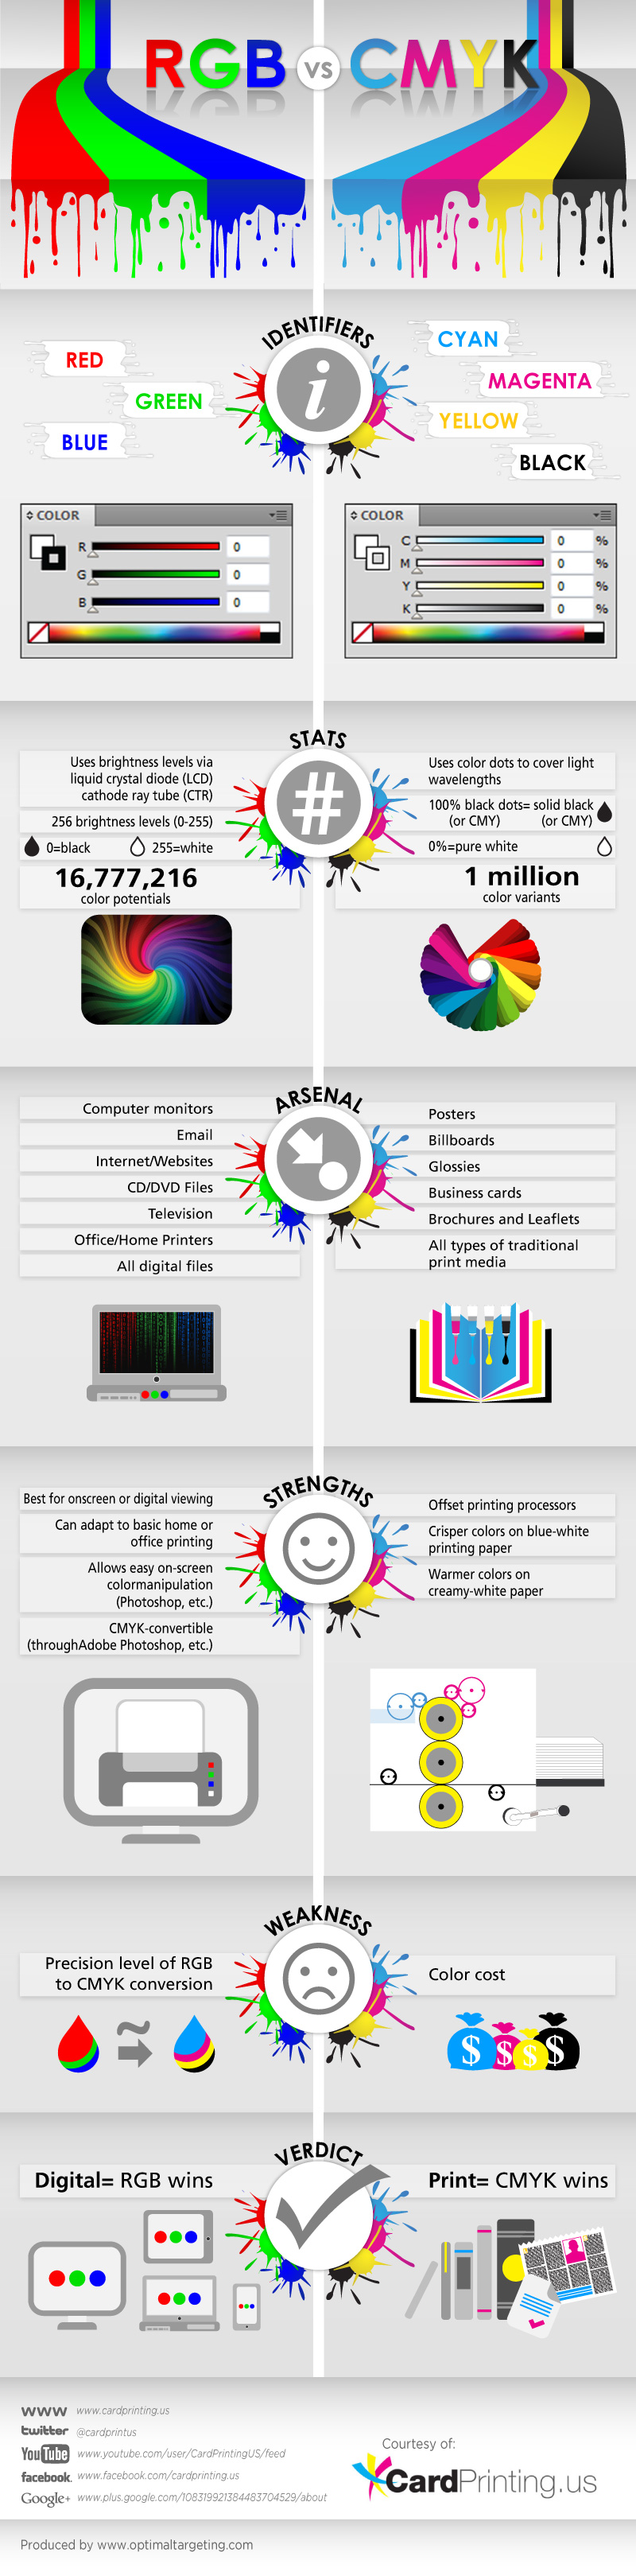 RGB vs CMYK infographic